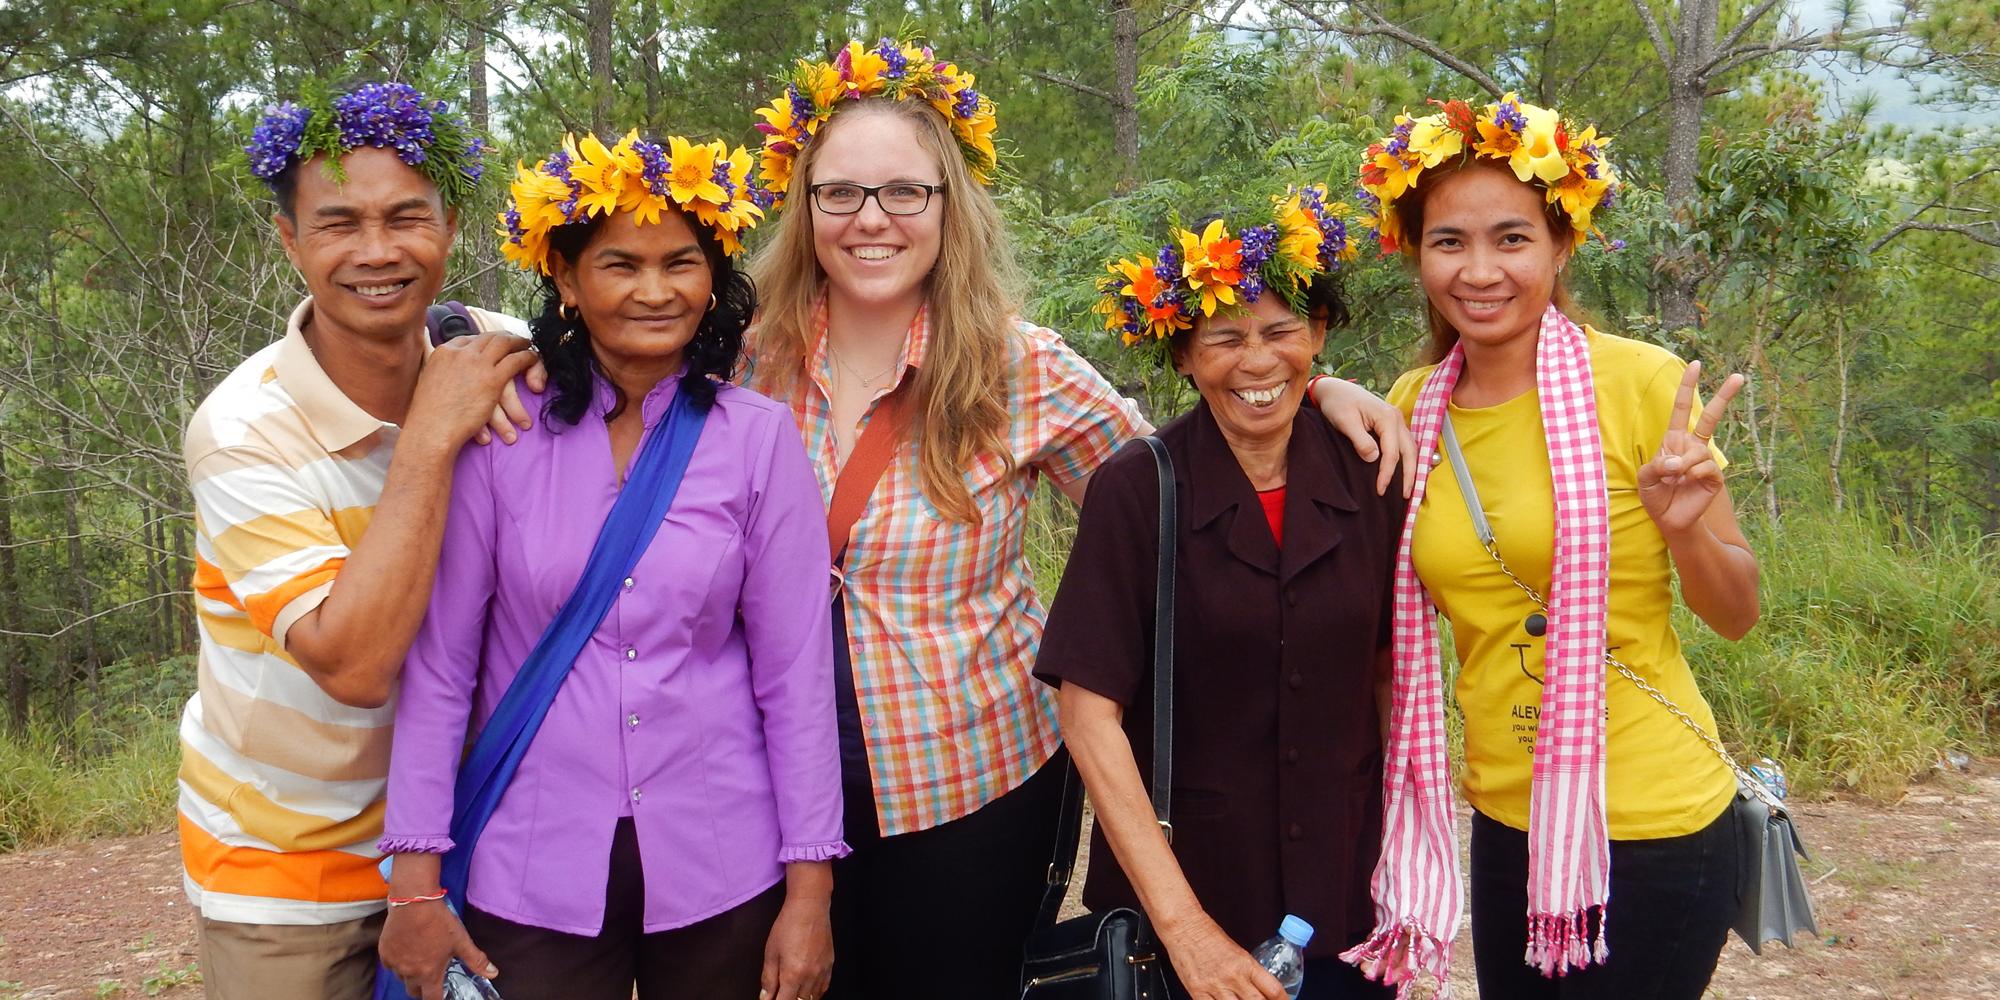 Eintauchen in eine fremde Kultur - Daniela, Kambodscha